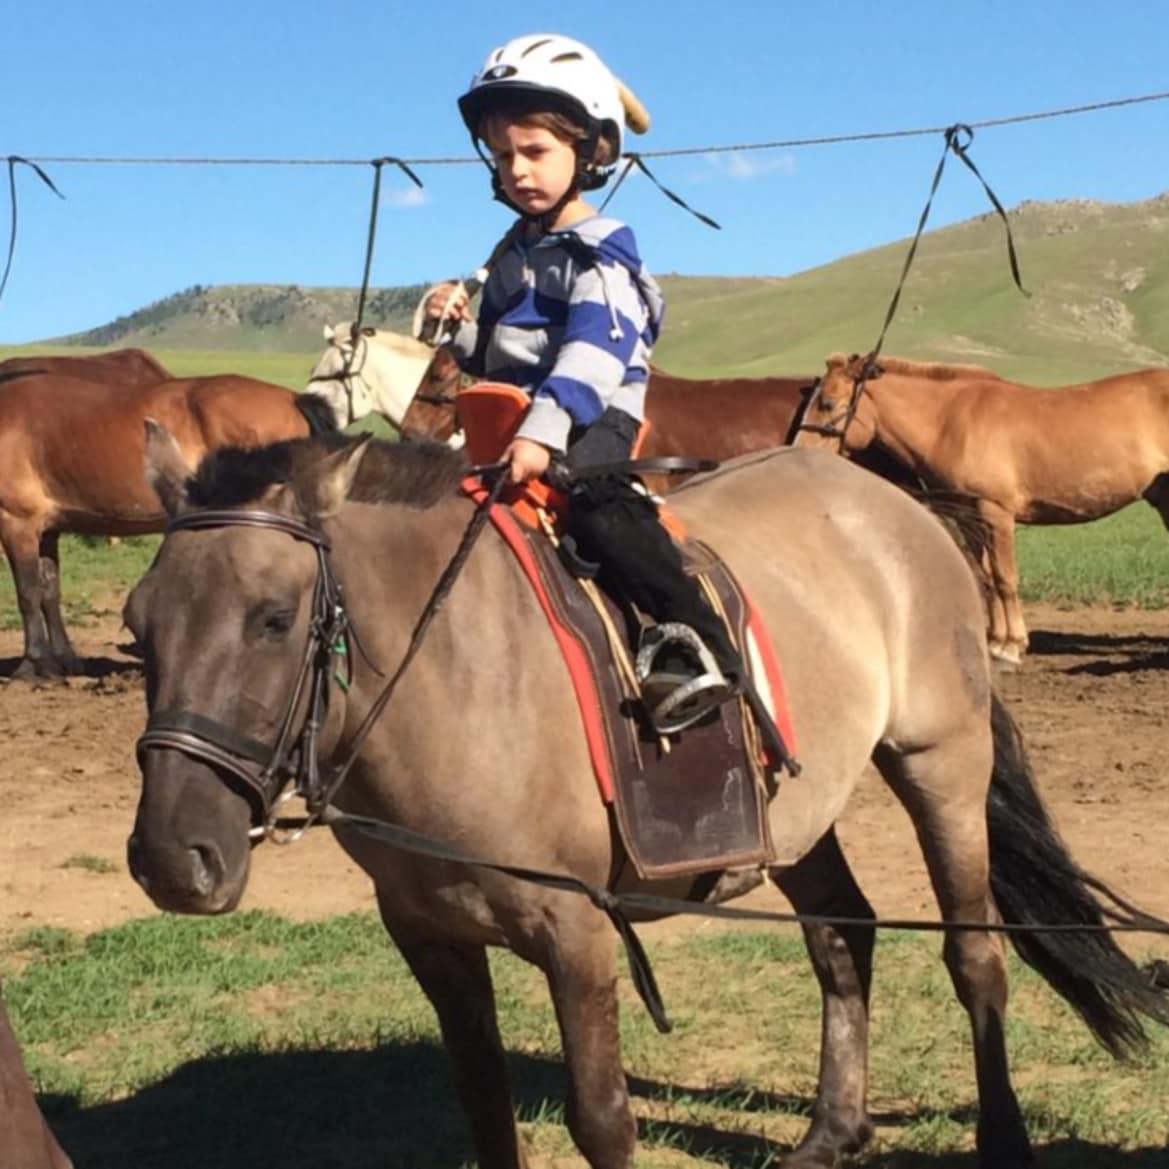 Exploring on Horseback - The Pavilions Mongolia